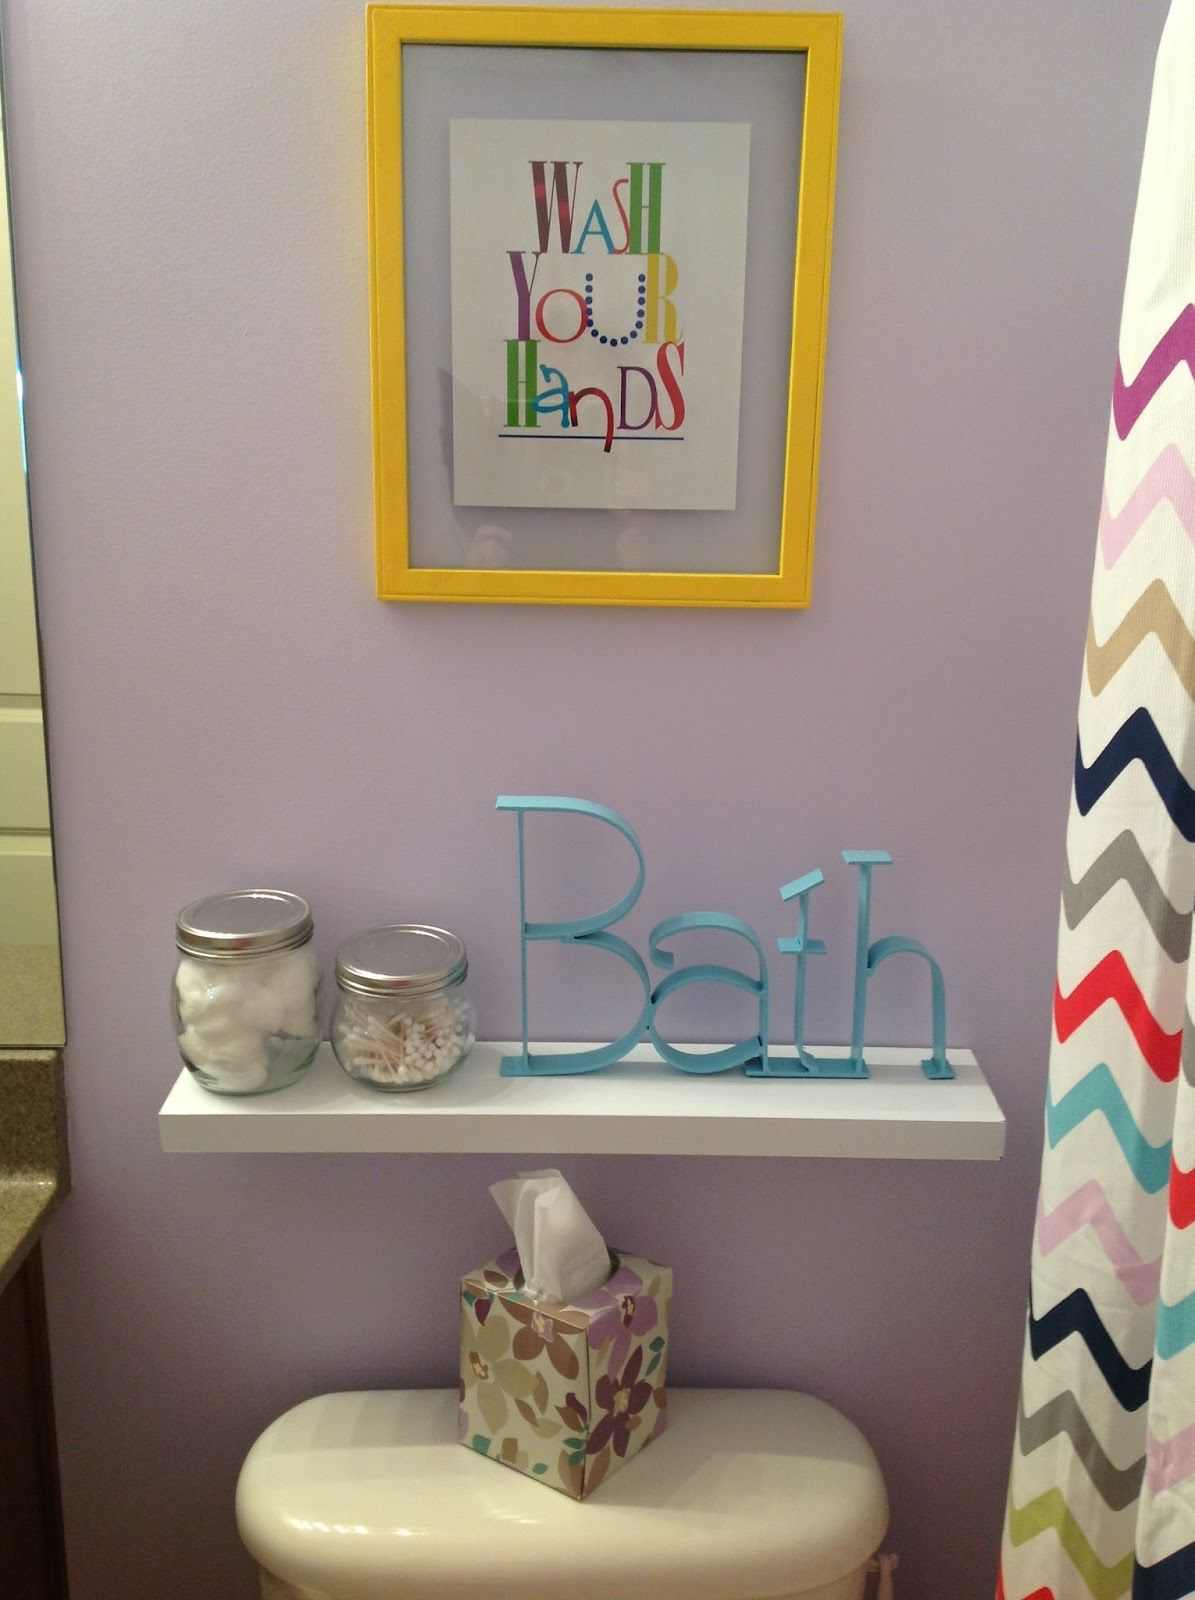 Bathroom, : Gorgeous Ideas For Unisex Kid Bathroom Decoration Using Light  Plum Bathroom Wall Paint Along With White Seashell Bathroom Decor And  Colorful ...